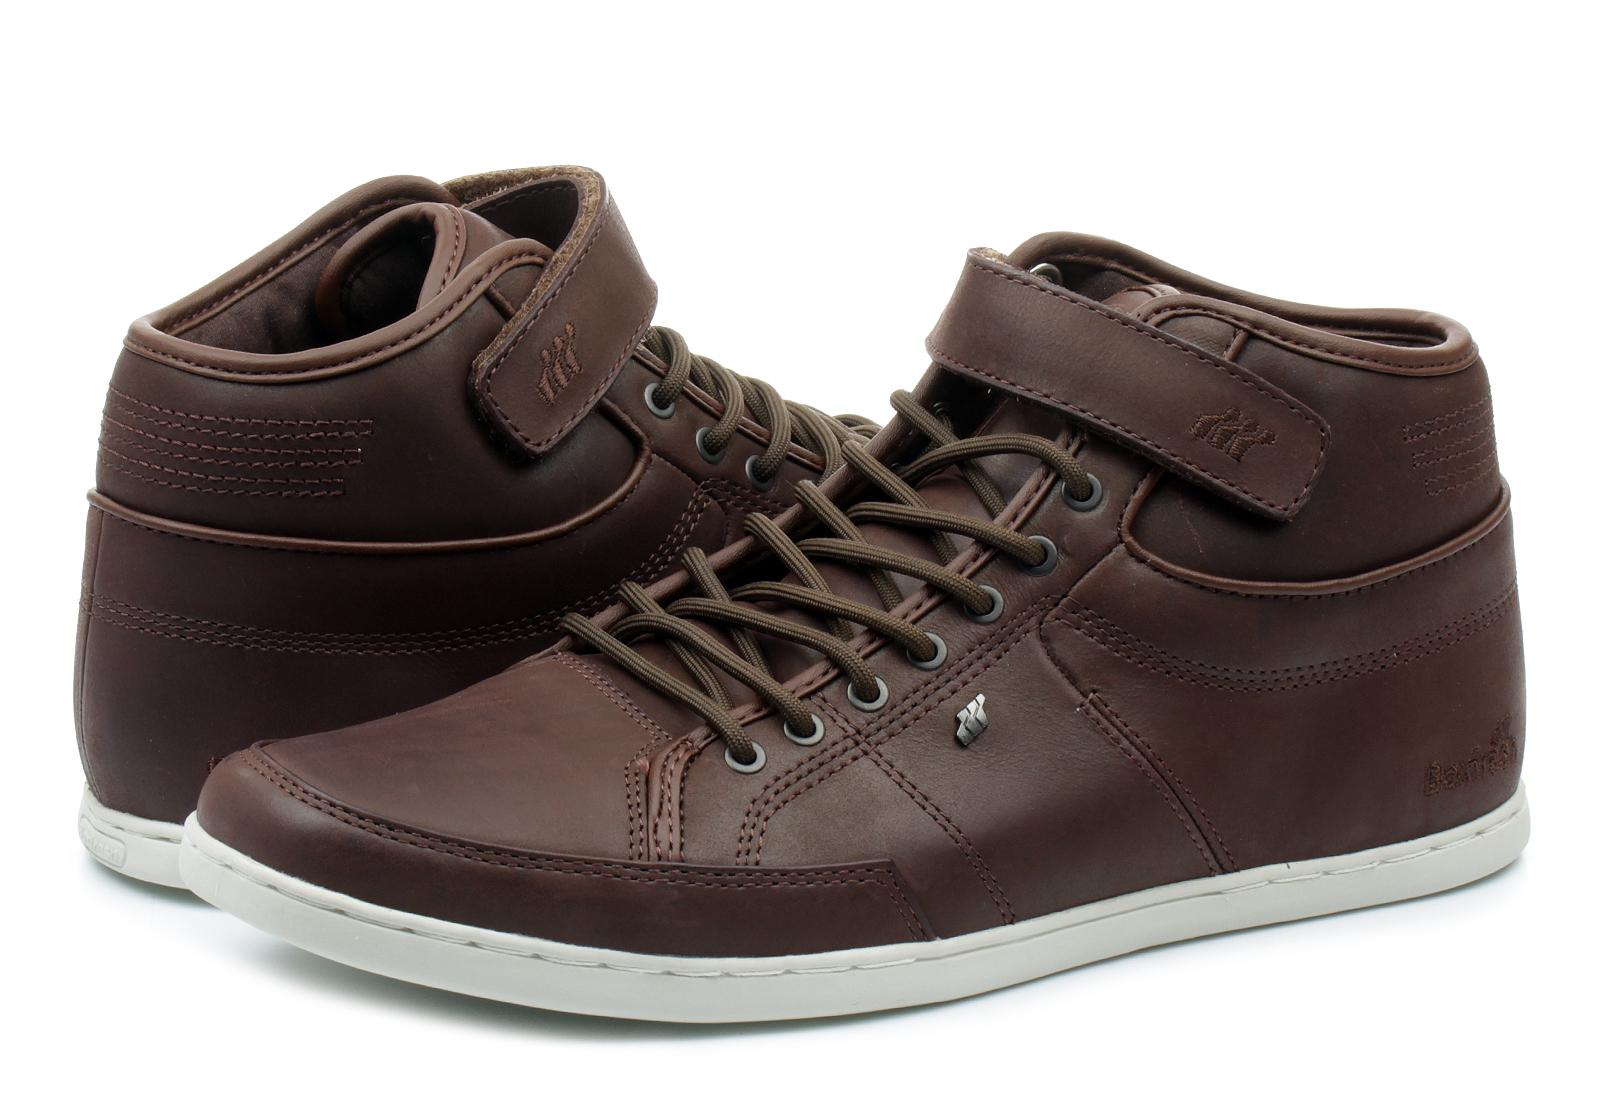 100% authentic eeb64 43ea2 Boxfresh Shoes - Swich Prem - E15203-chn - Online shop for sneakers, shoes  and boots